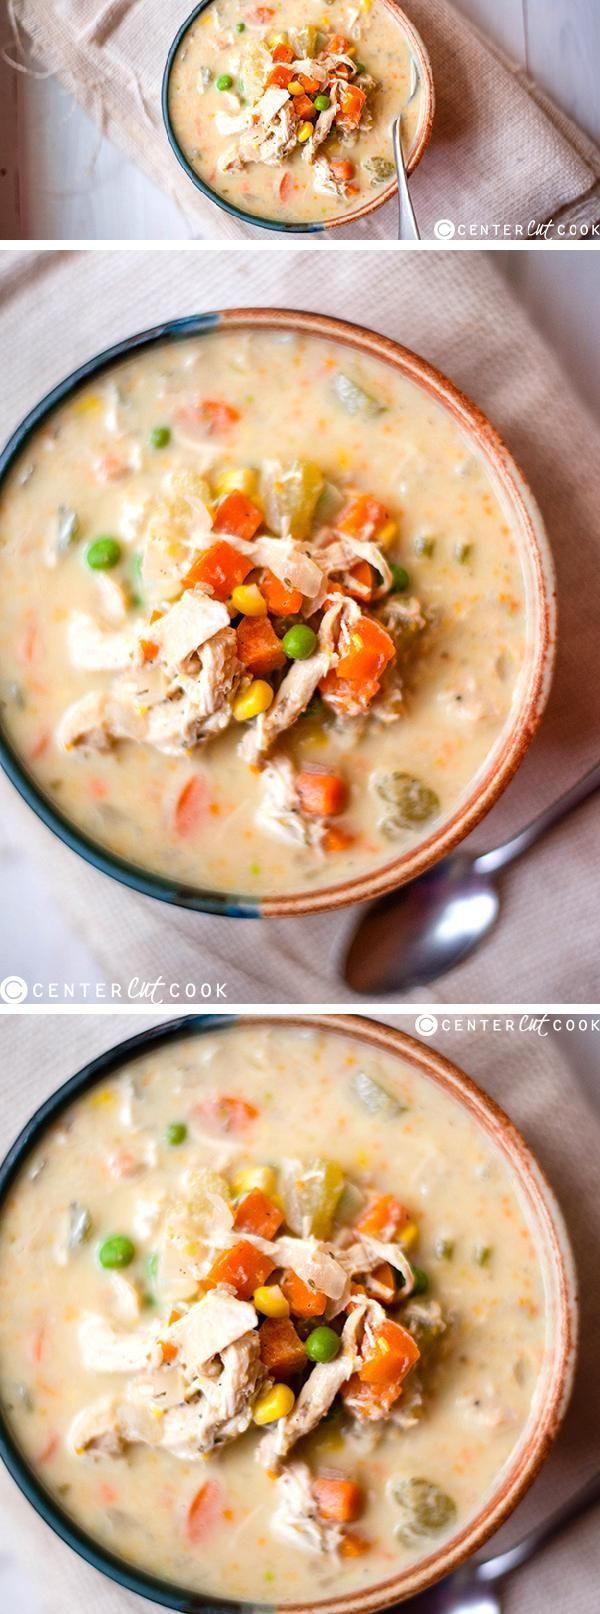 Slow Cooker Healthy Chicken Pot Pie Stew | Recipe ...